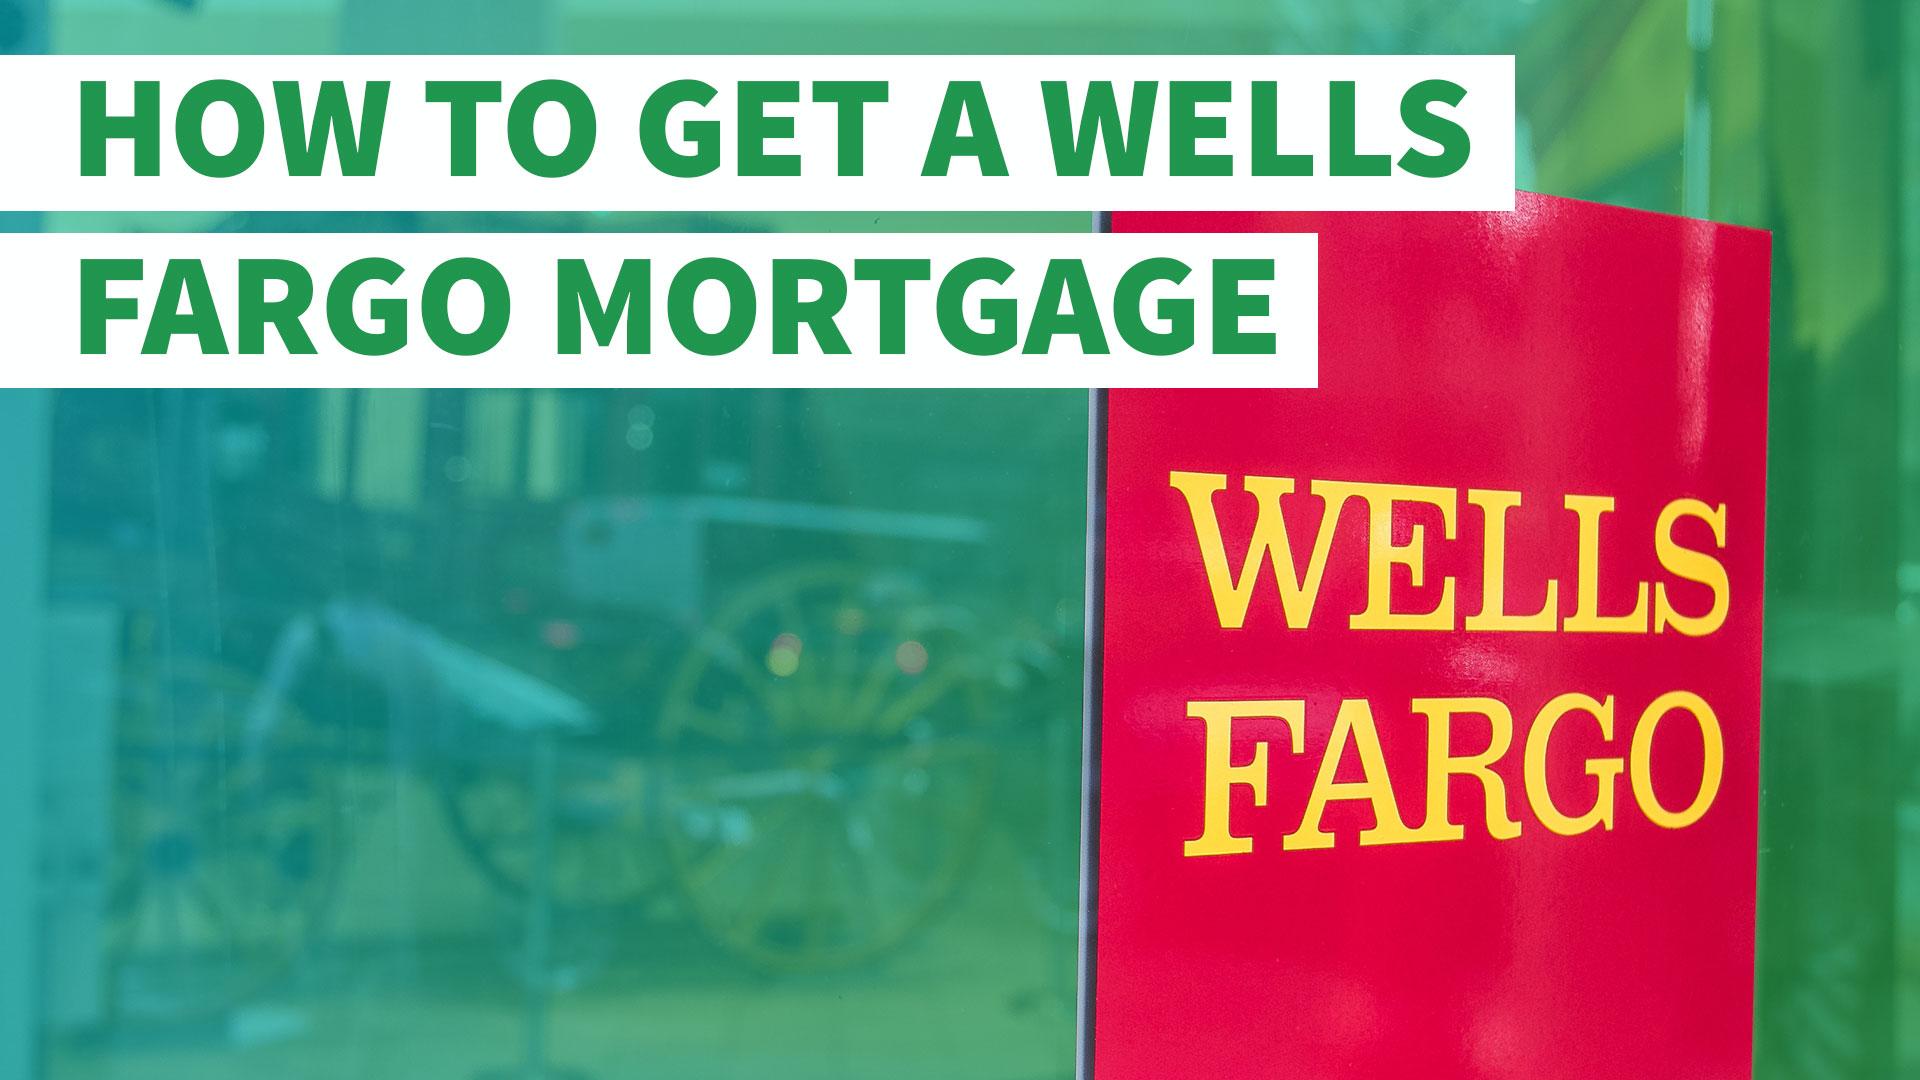 how to get a wells fargo mortgage gobankingrates. Black Bedroom Furniture Sets. Home Design Ideas